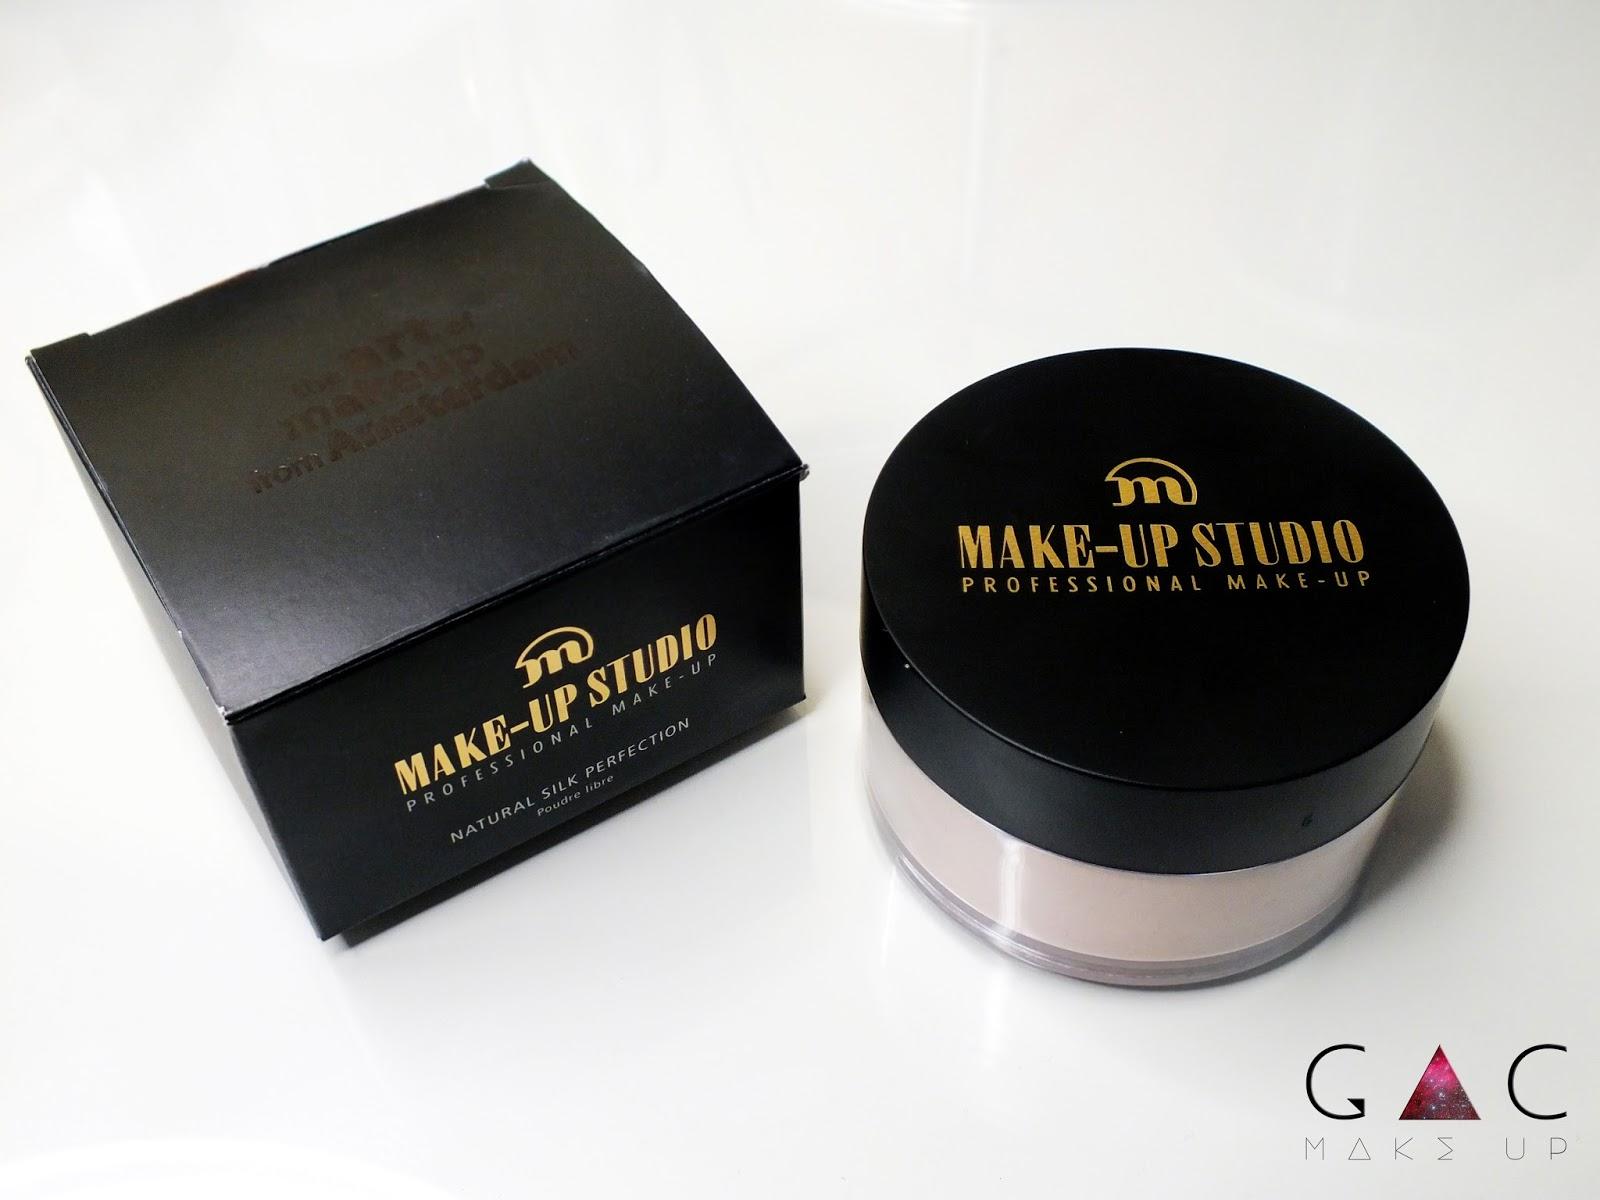 MAKE-UP STUDIO puder Natural Silk Perfection.